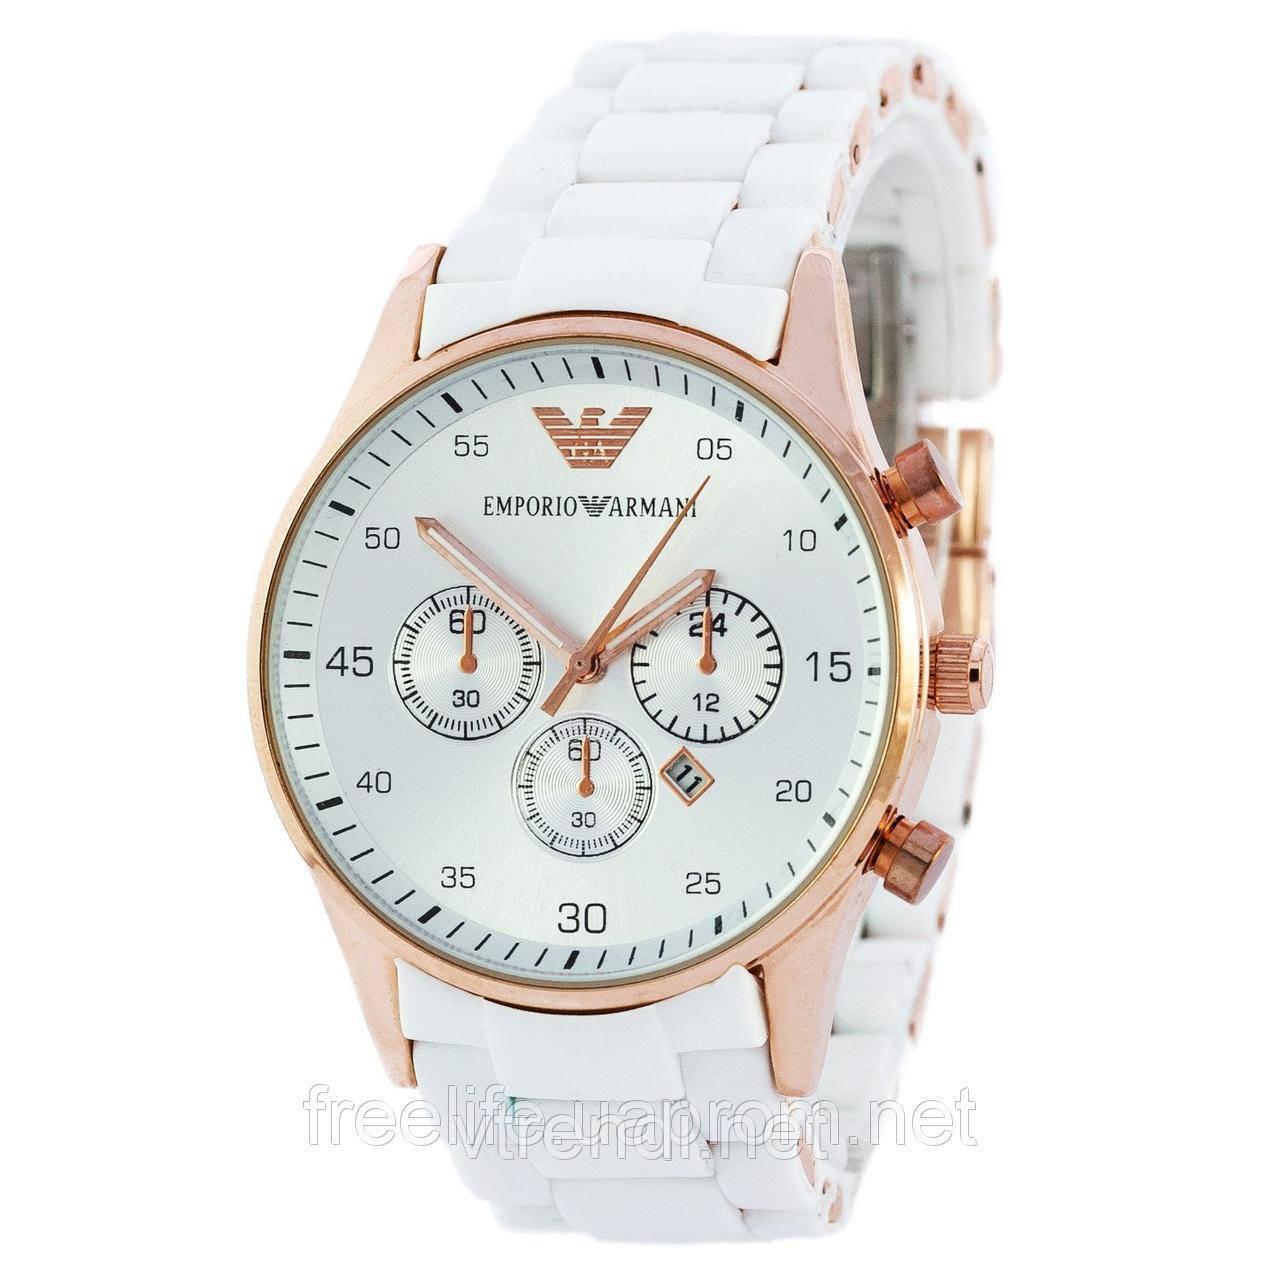 Элитные часы унисекс Emporio Armani белые